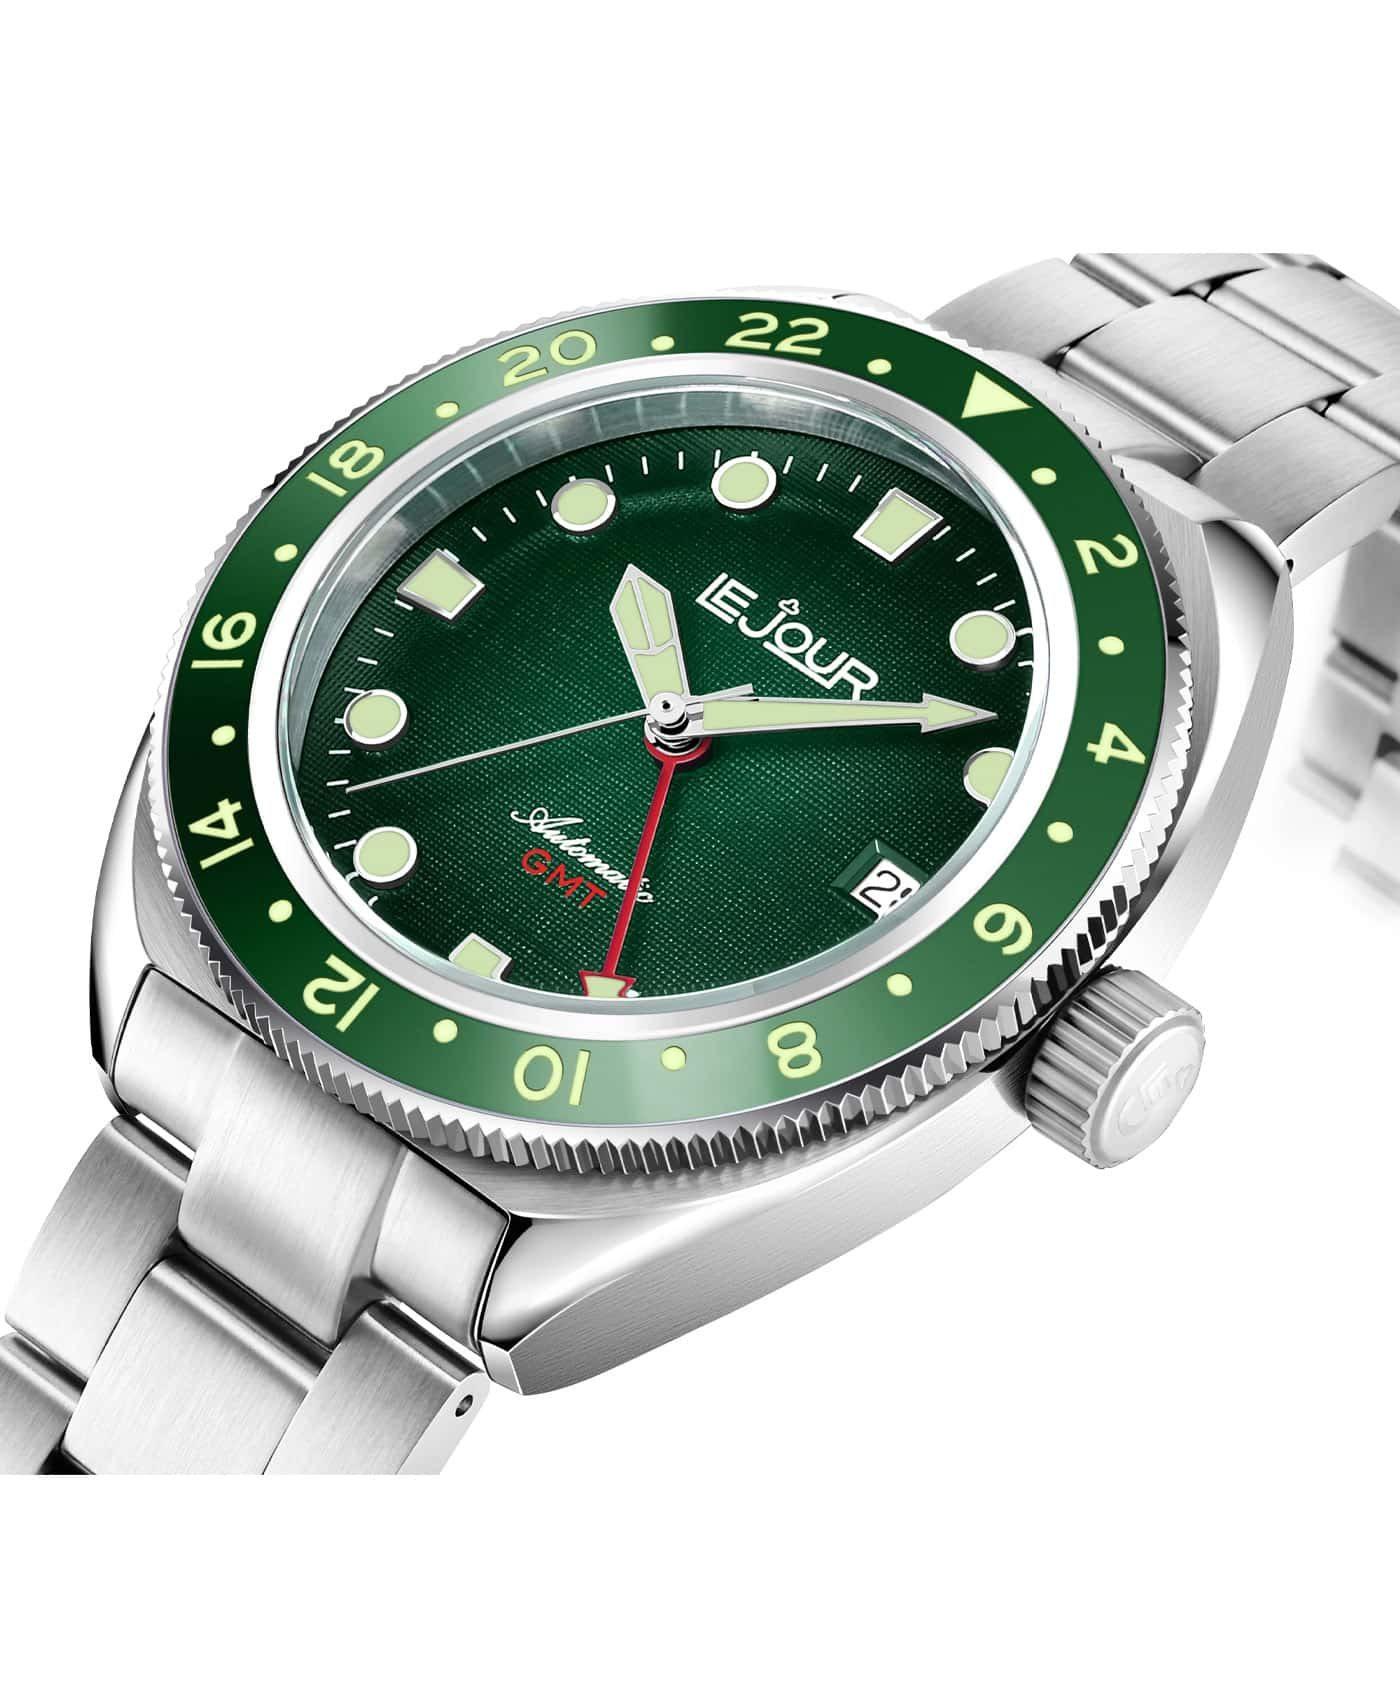 LJ-HH-GMT-003 textured green case side